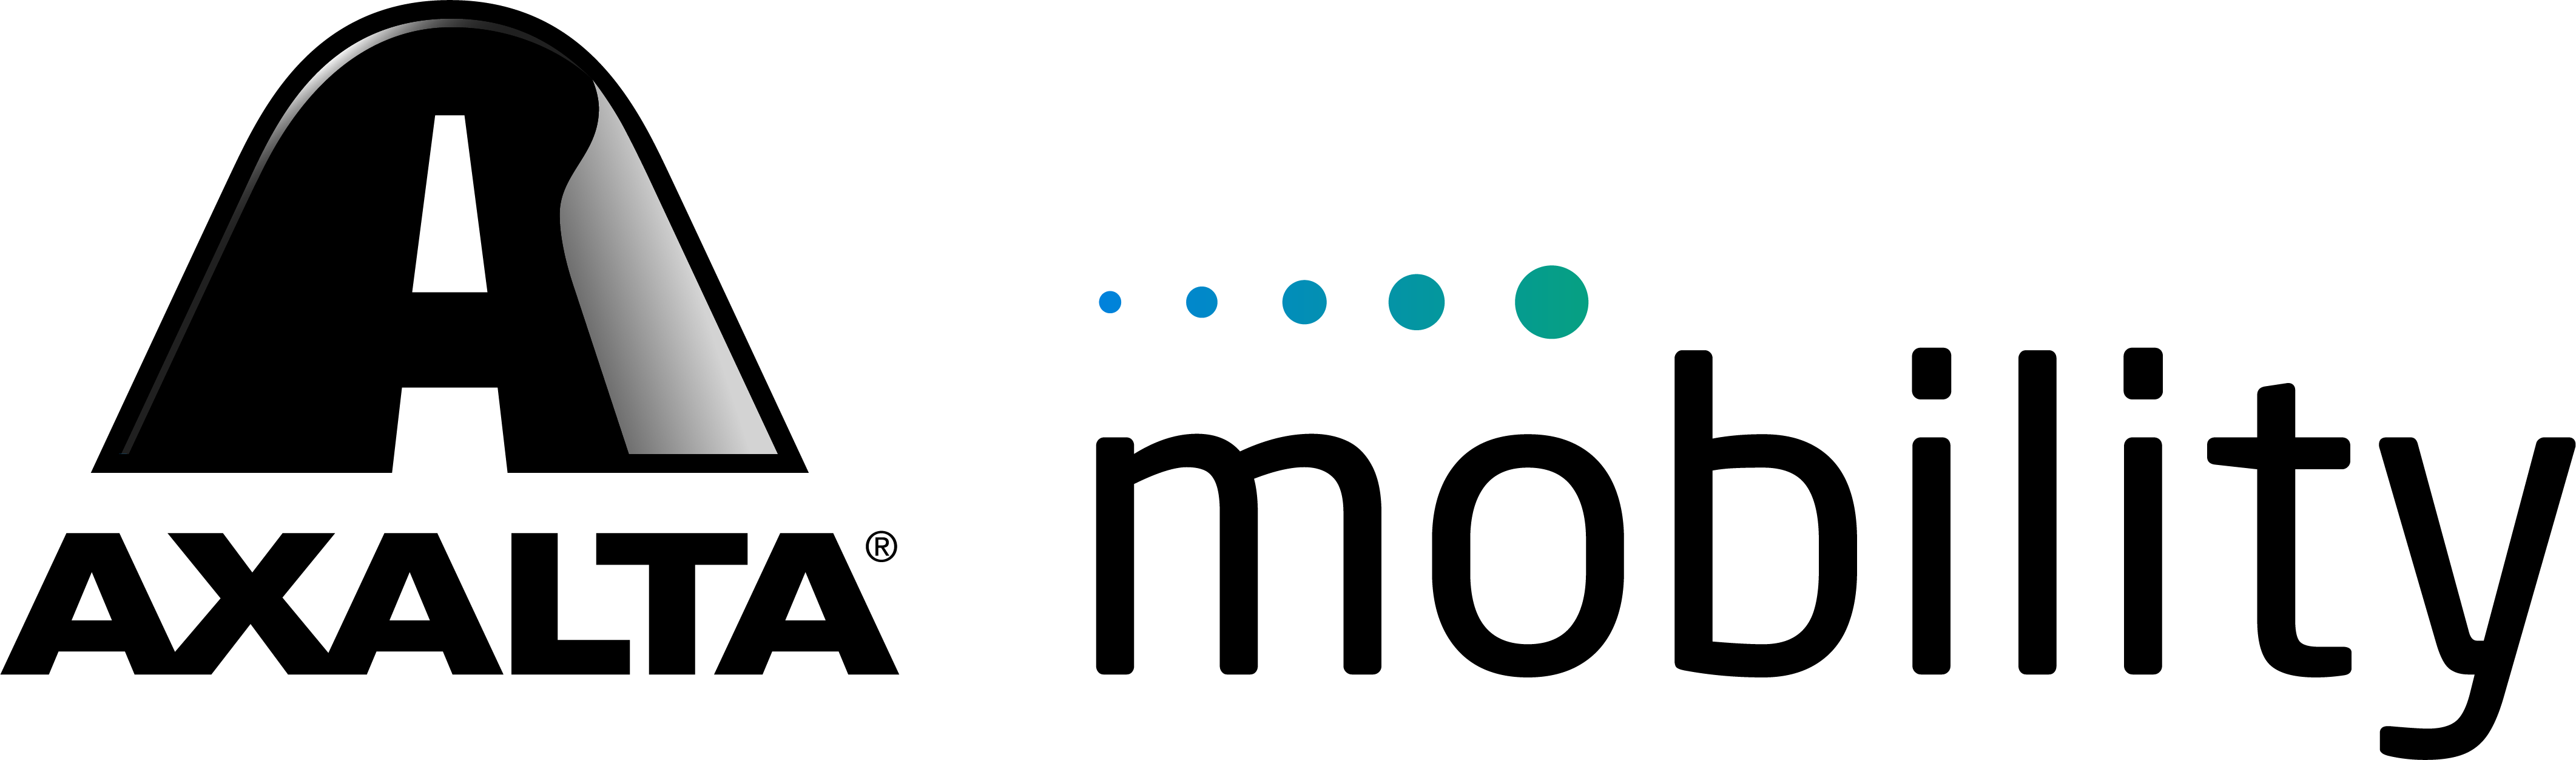 axalta-mobility-logo-black-rgb